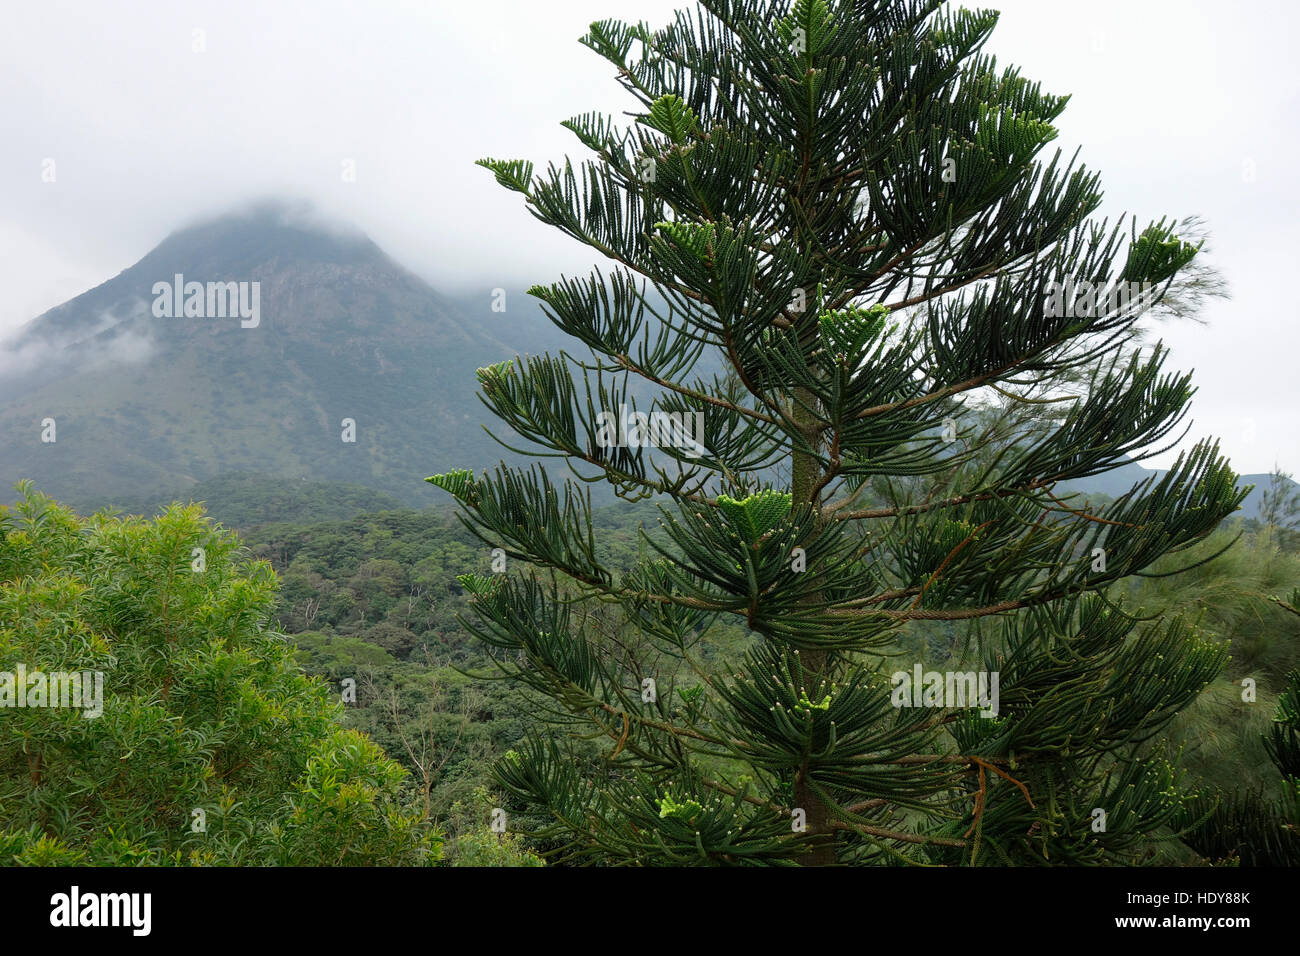 Lantau Peak, Lantau Island, Hong Kong, China - an area popular with hikers. - Stock Image